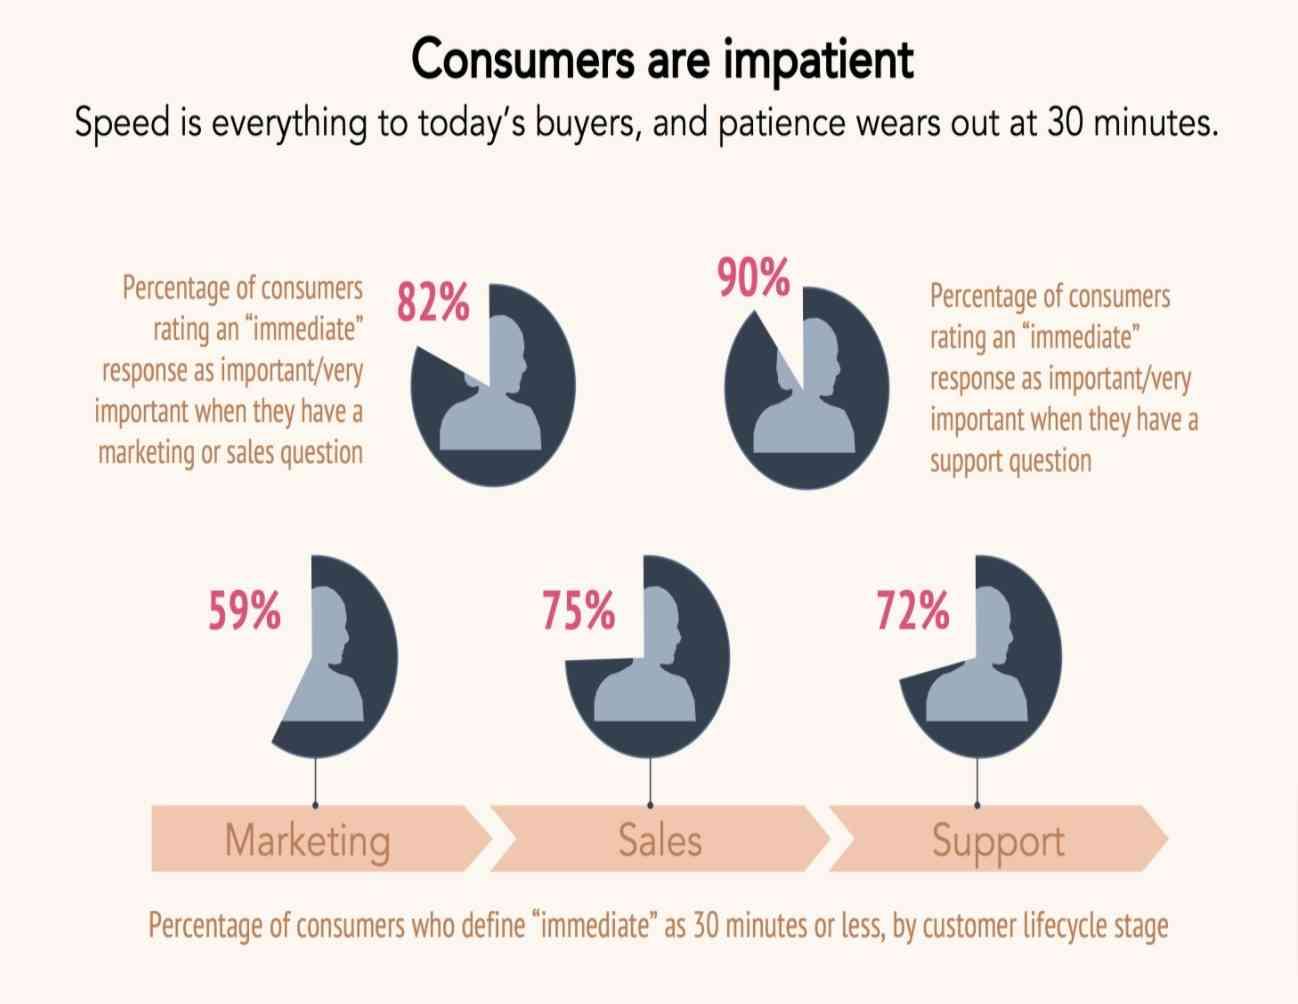 customers-love-immediate-response